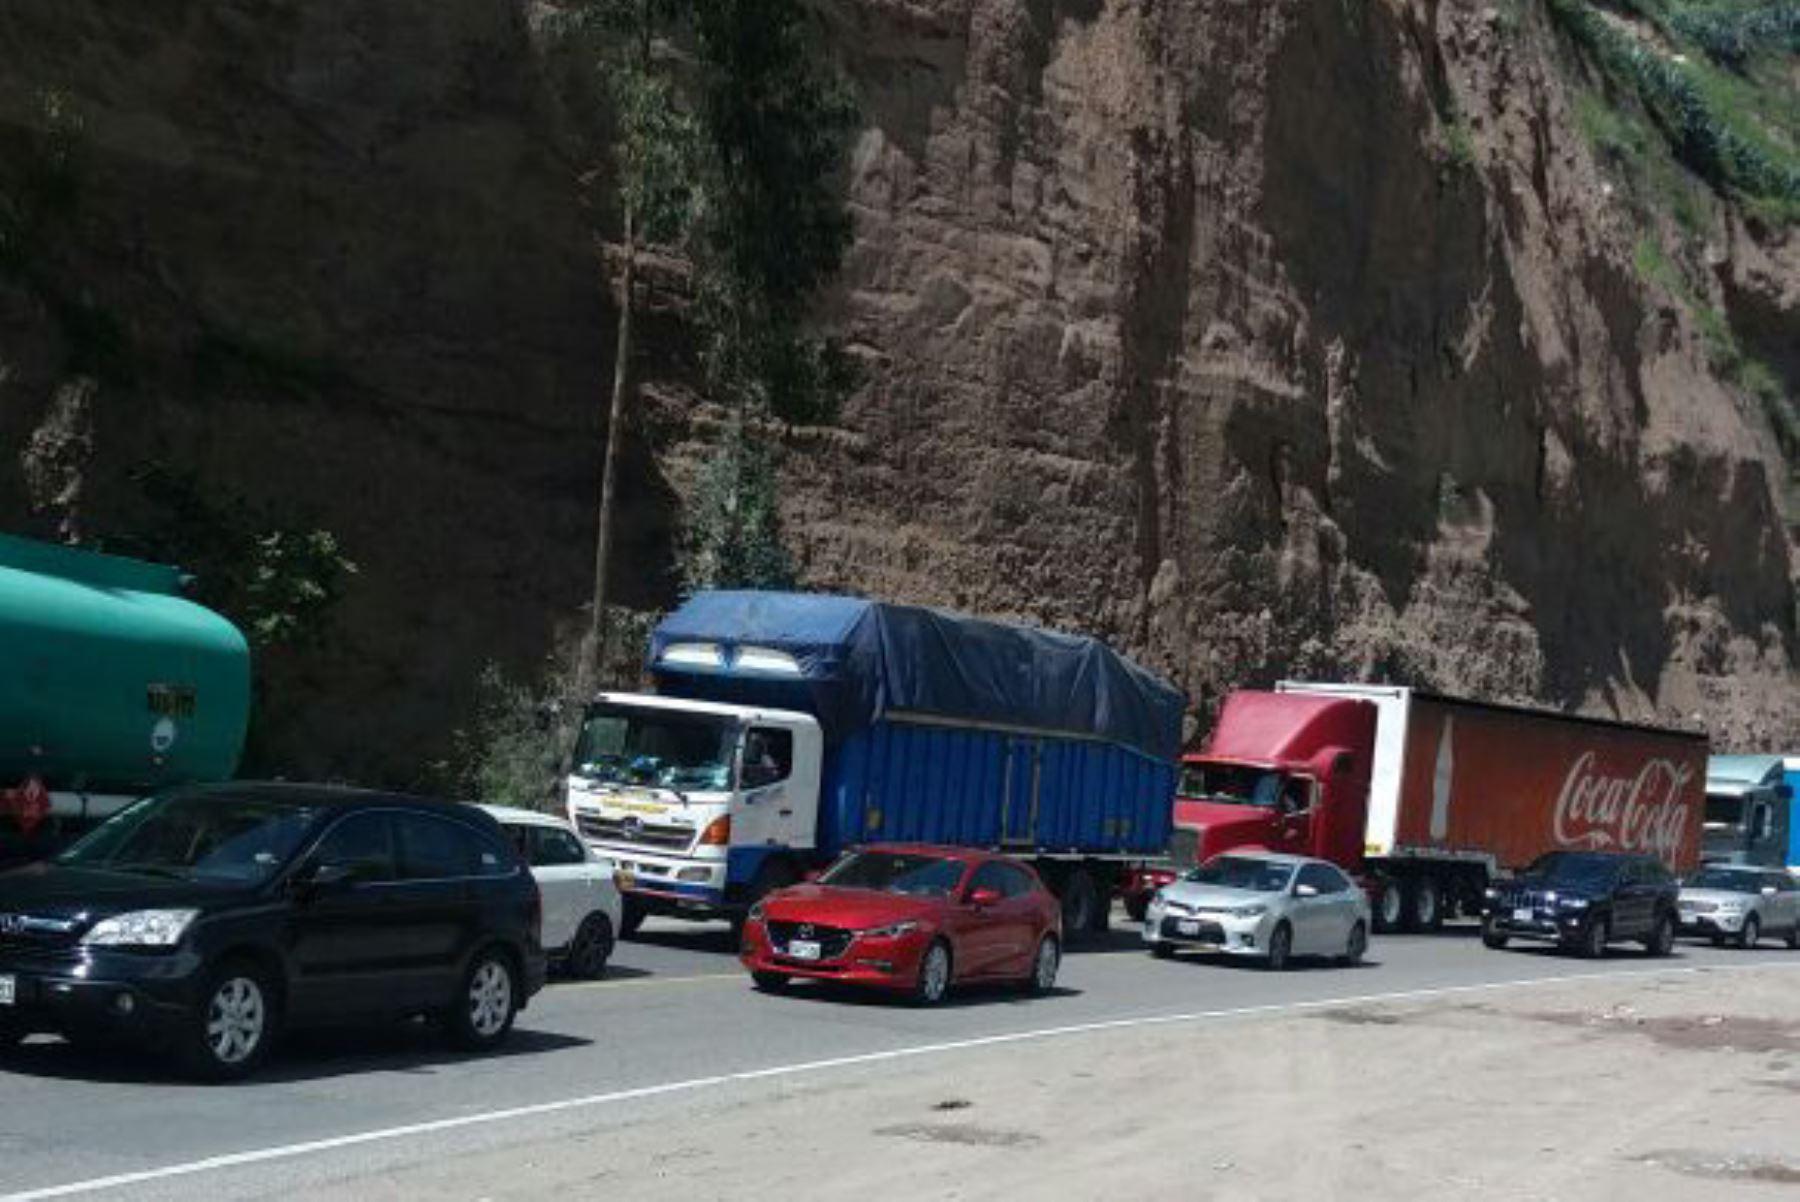 Carretera Central soporta ahora una lluvia intensa a la altura de La Oroya. ANDINA/Archivo